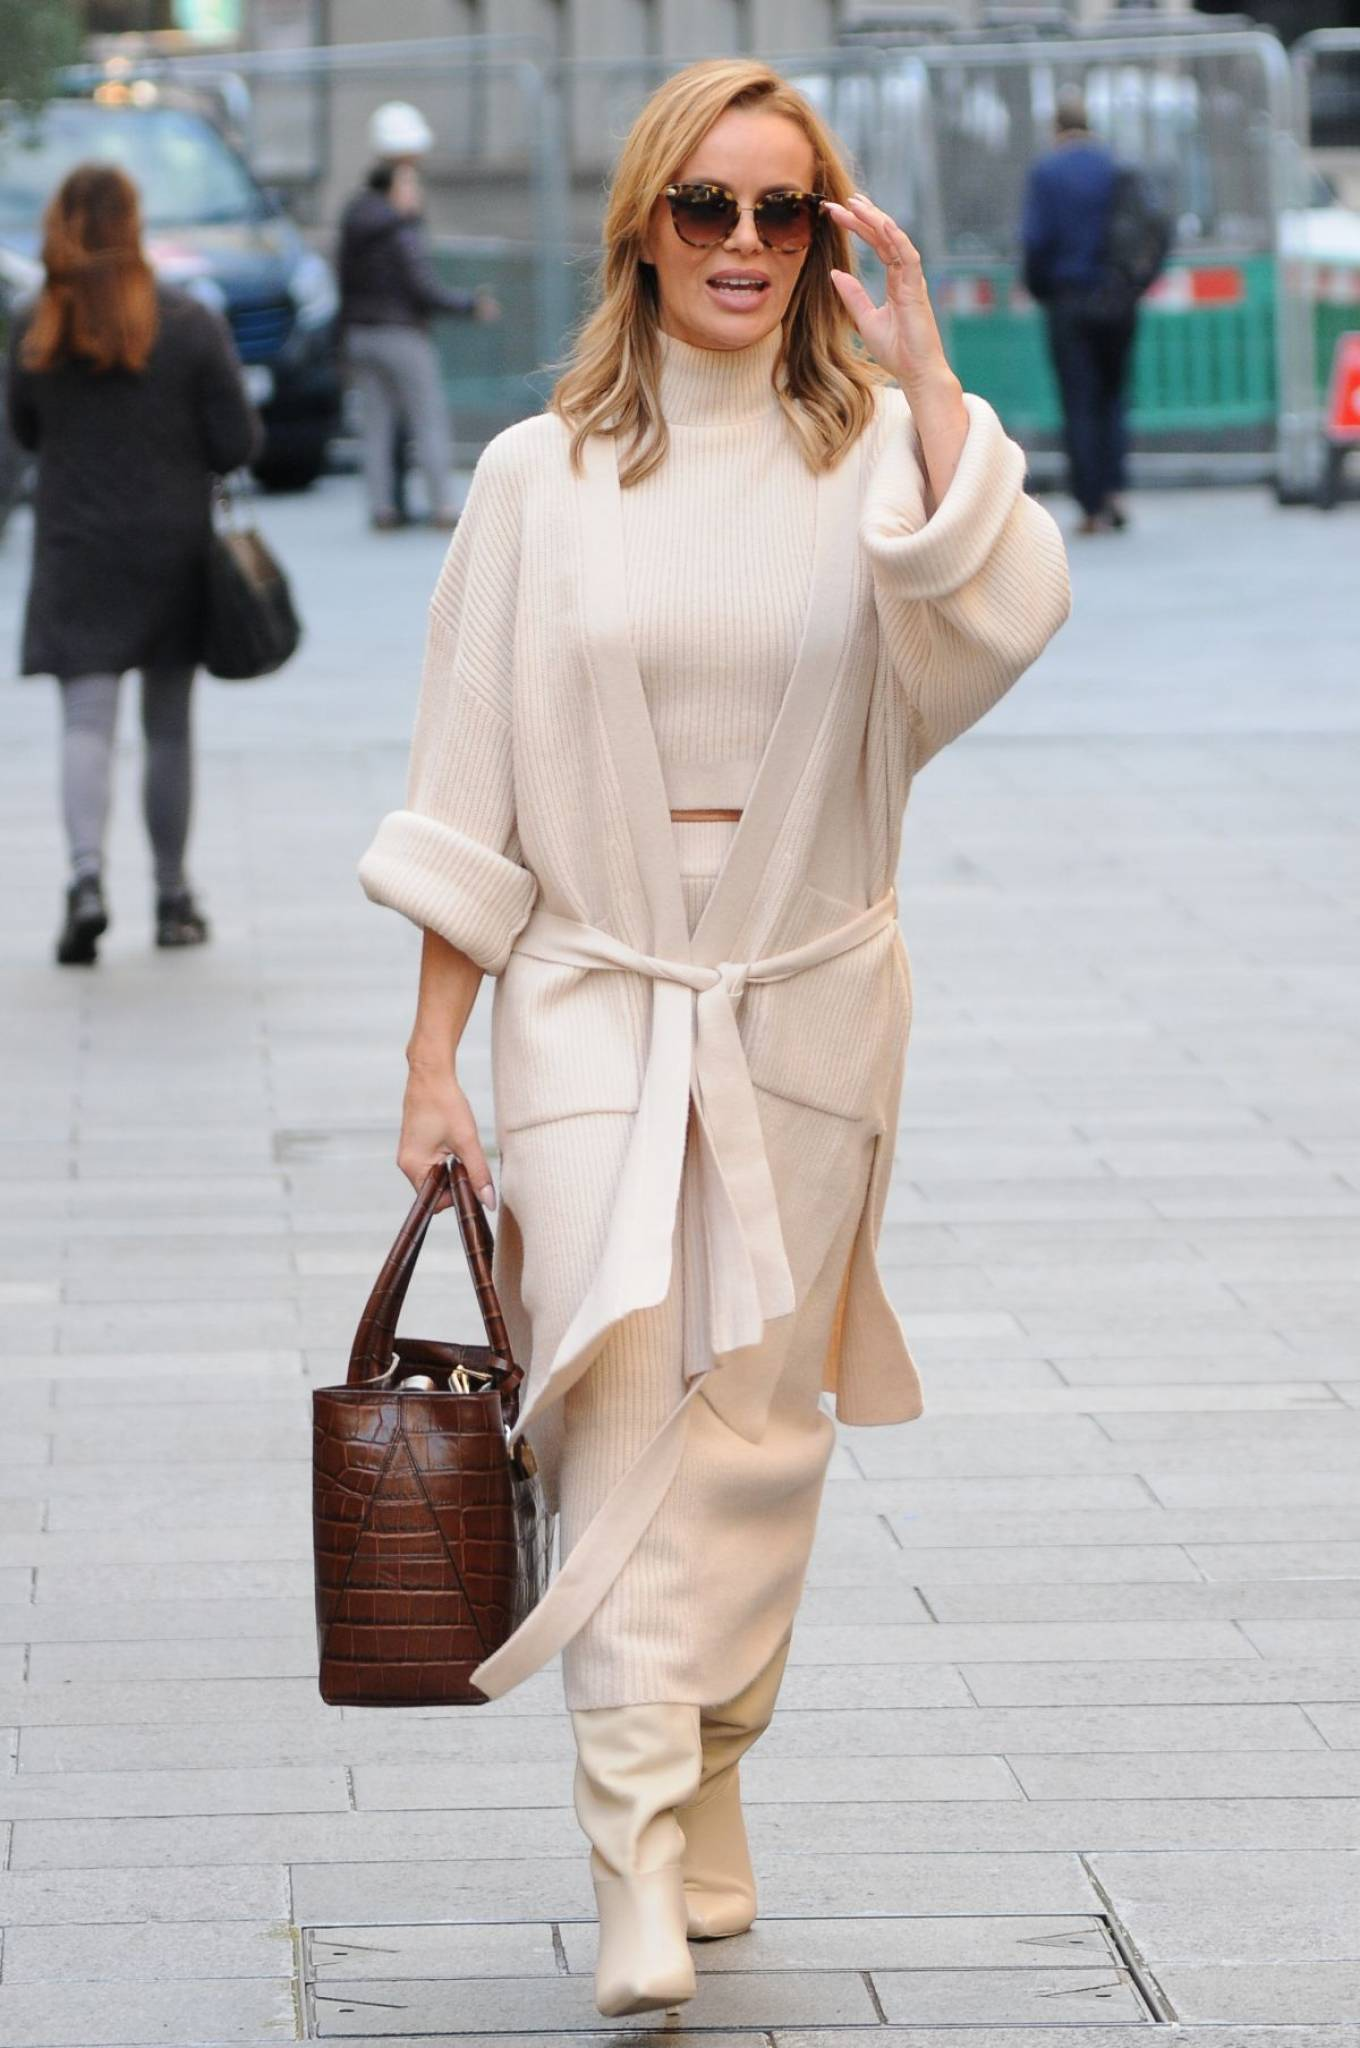 Amanda Holden - spotted leaving Global Radio in London